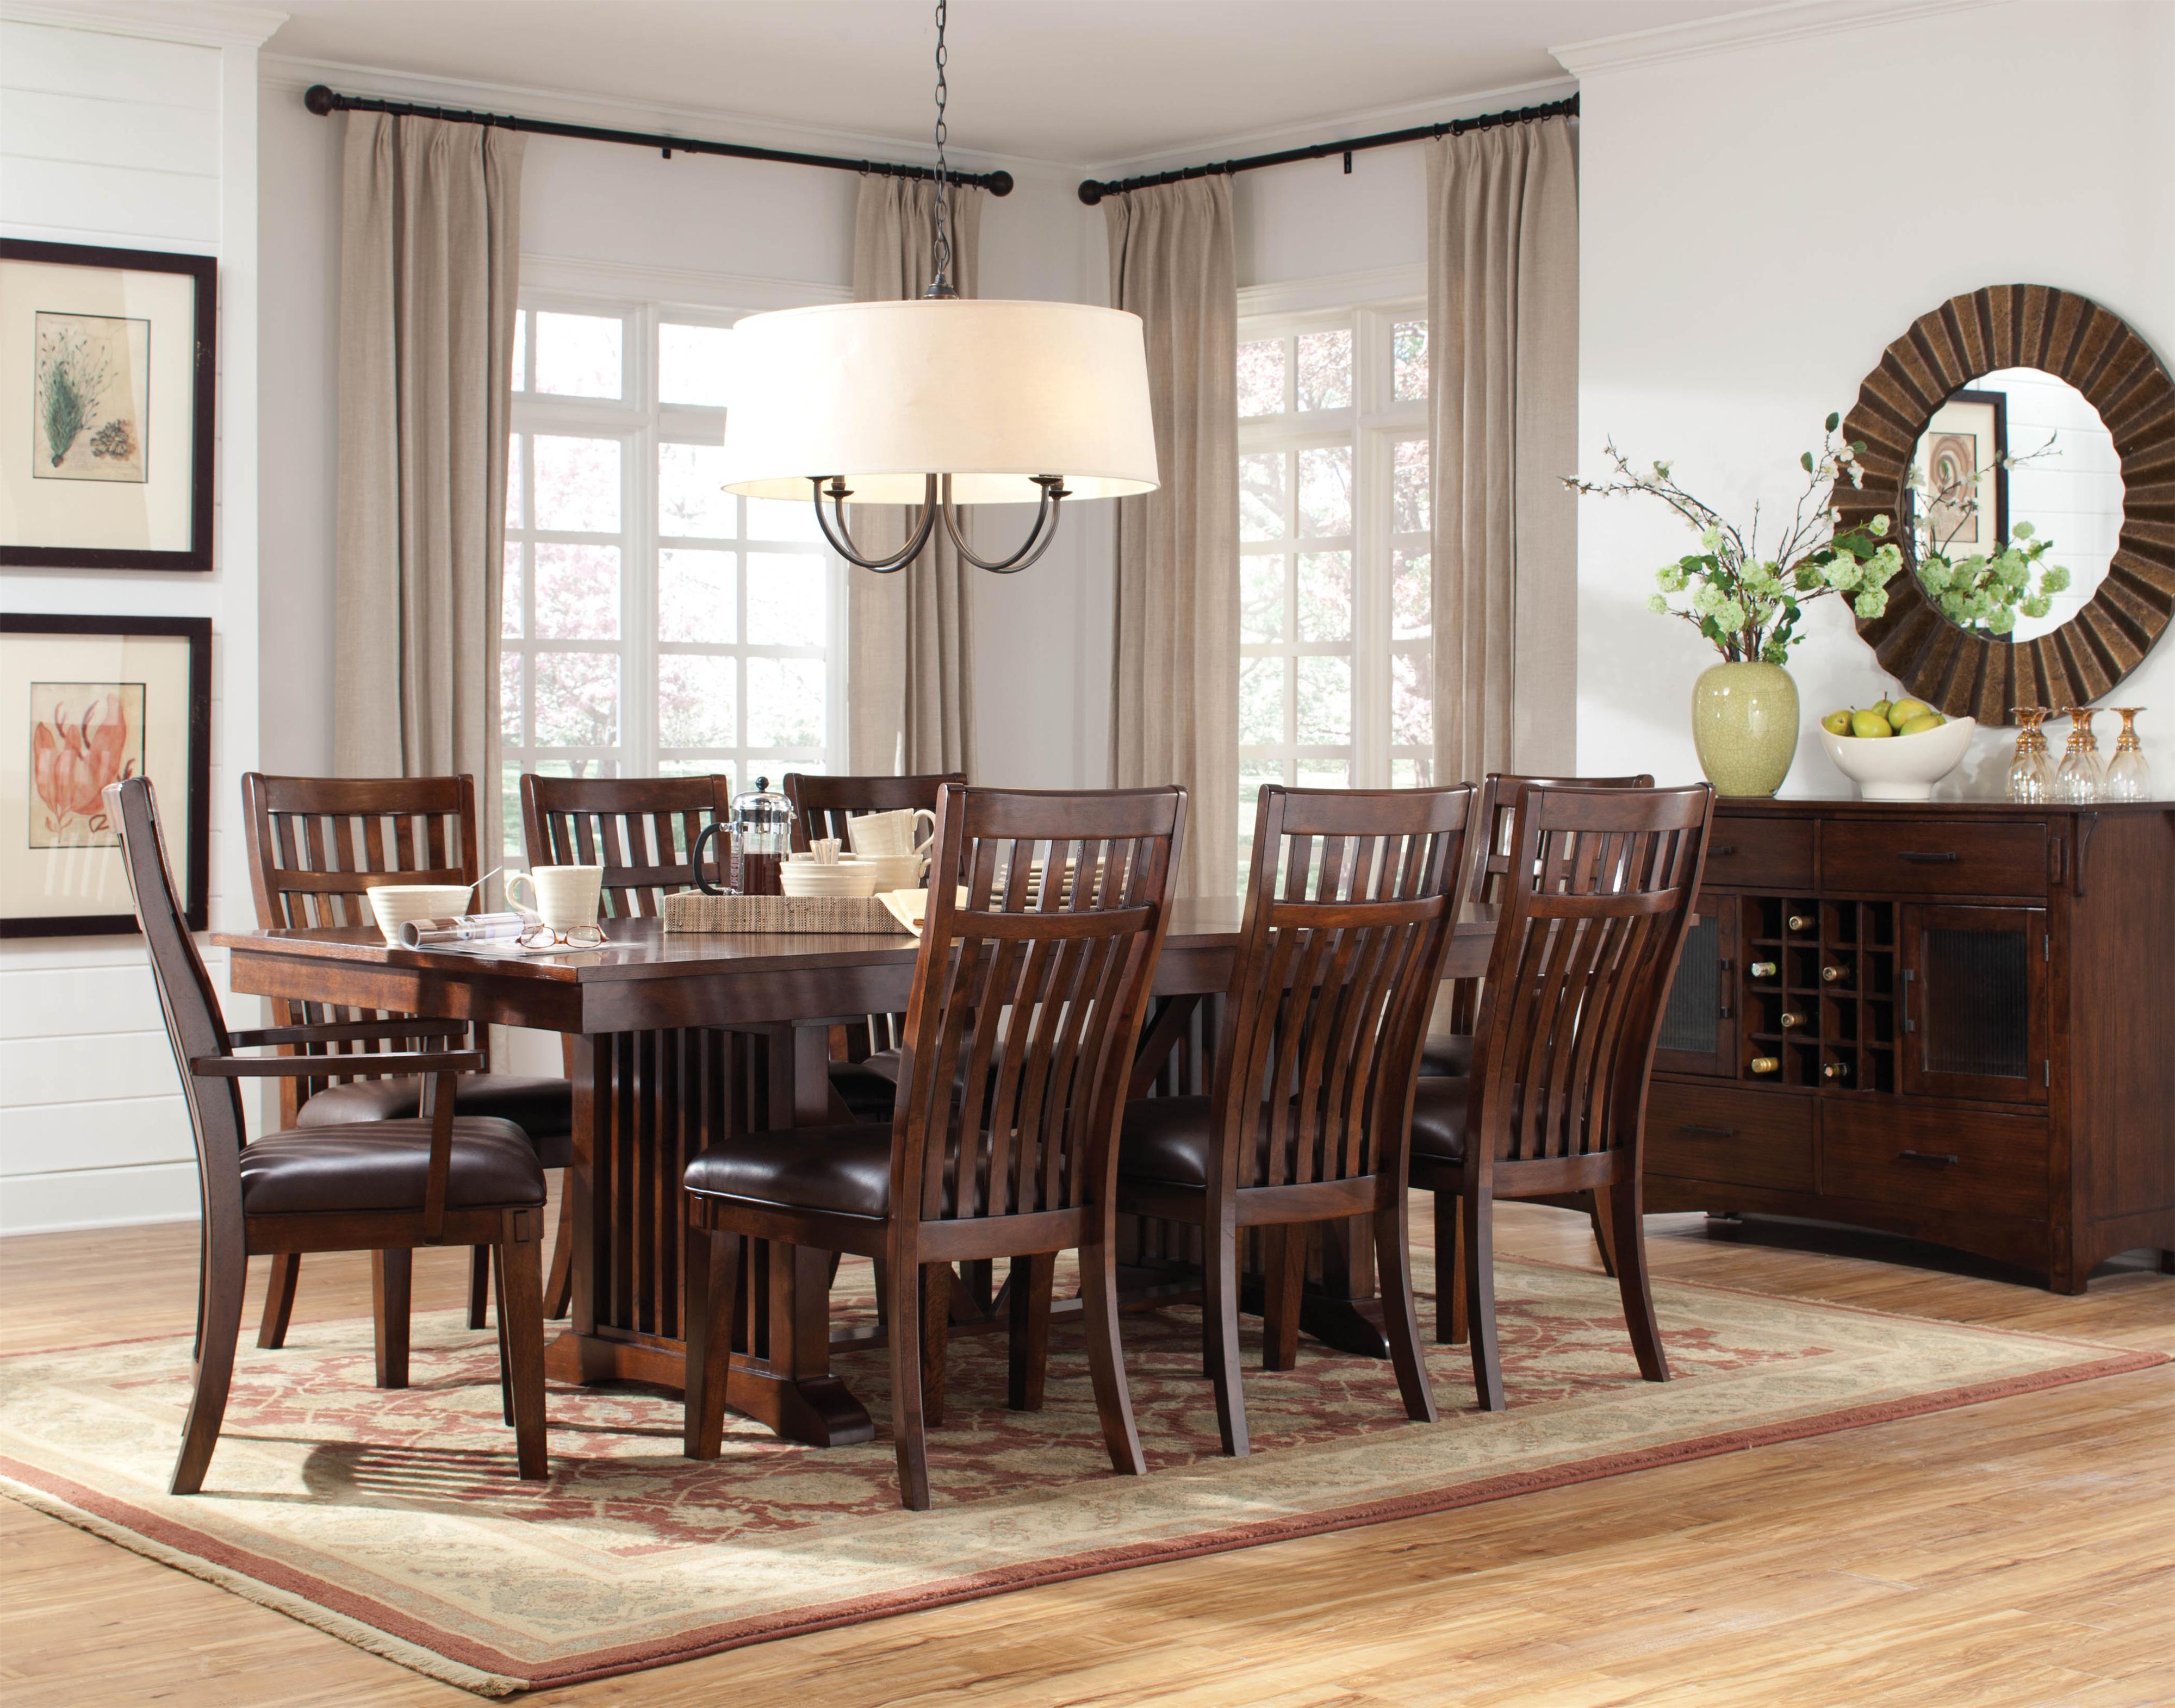 Standard Furniture Artisan Loft Dining Room Group 1 - Item Number: Dining Room Group 1